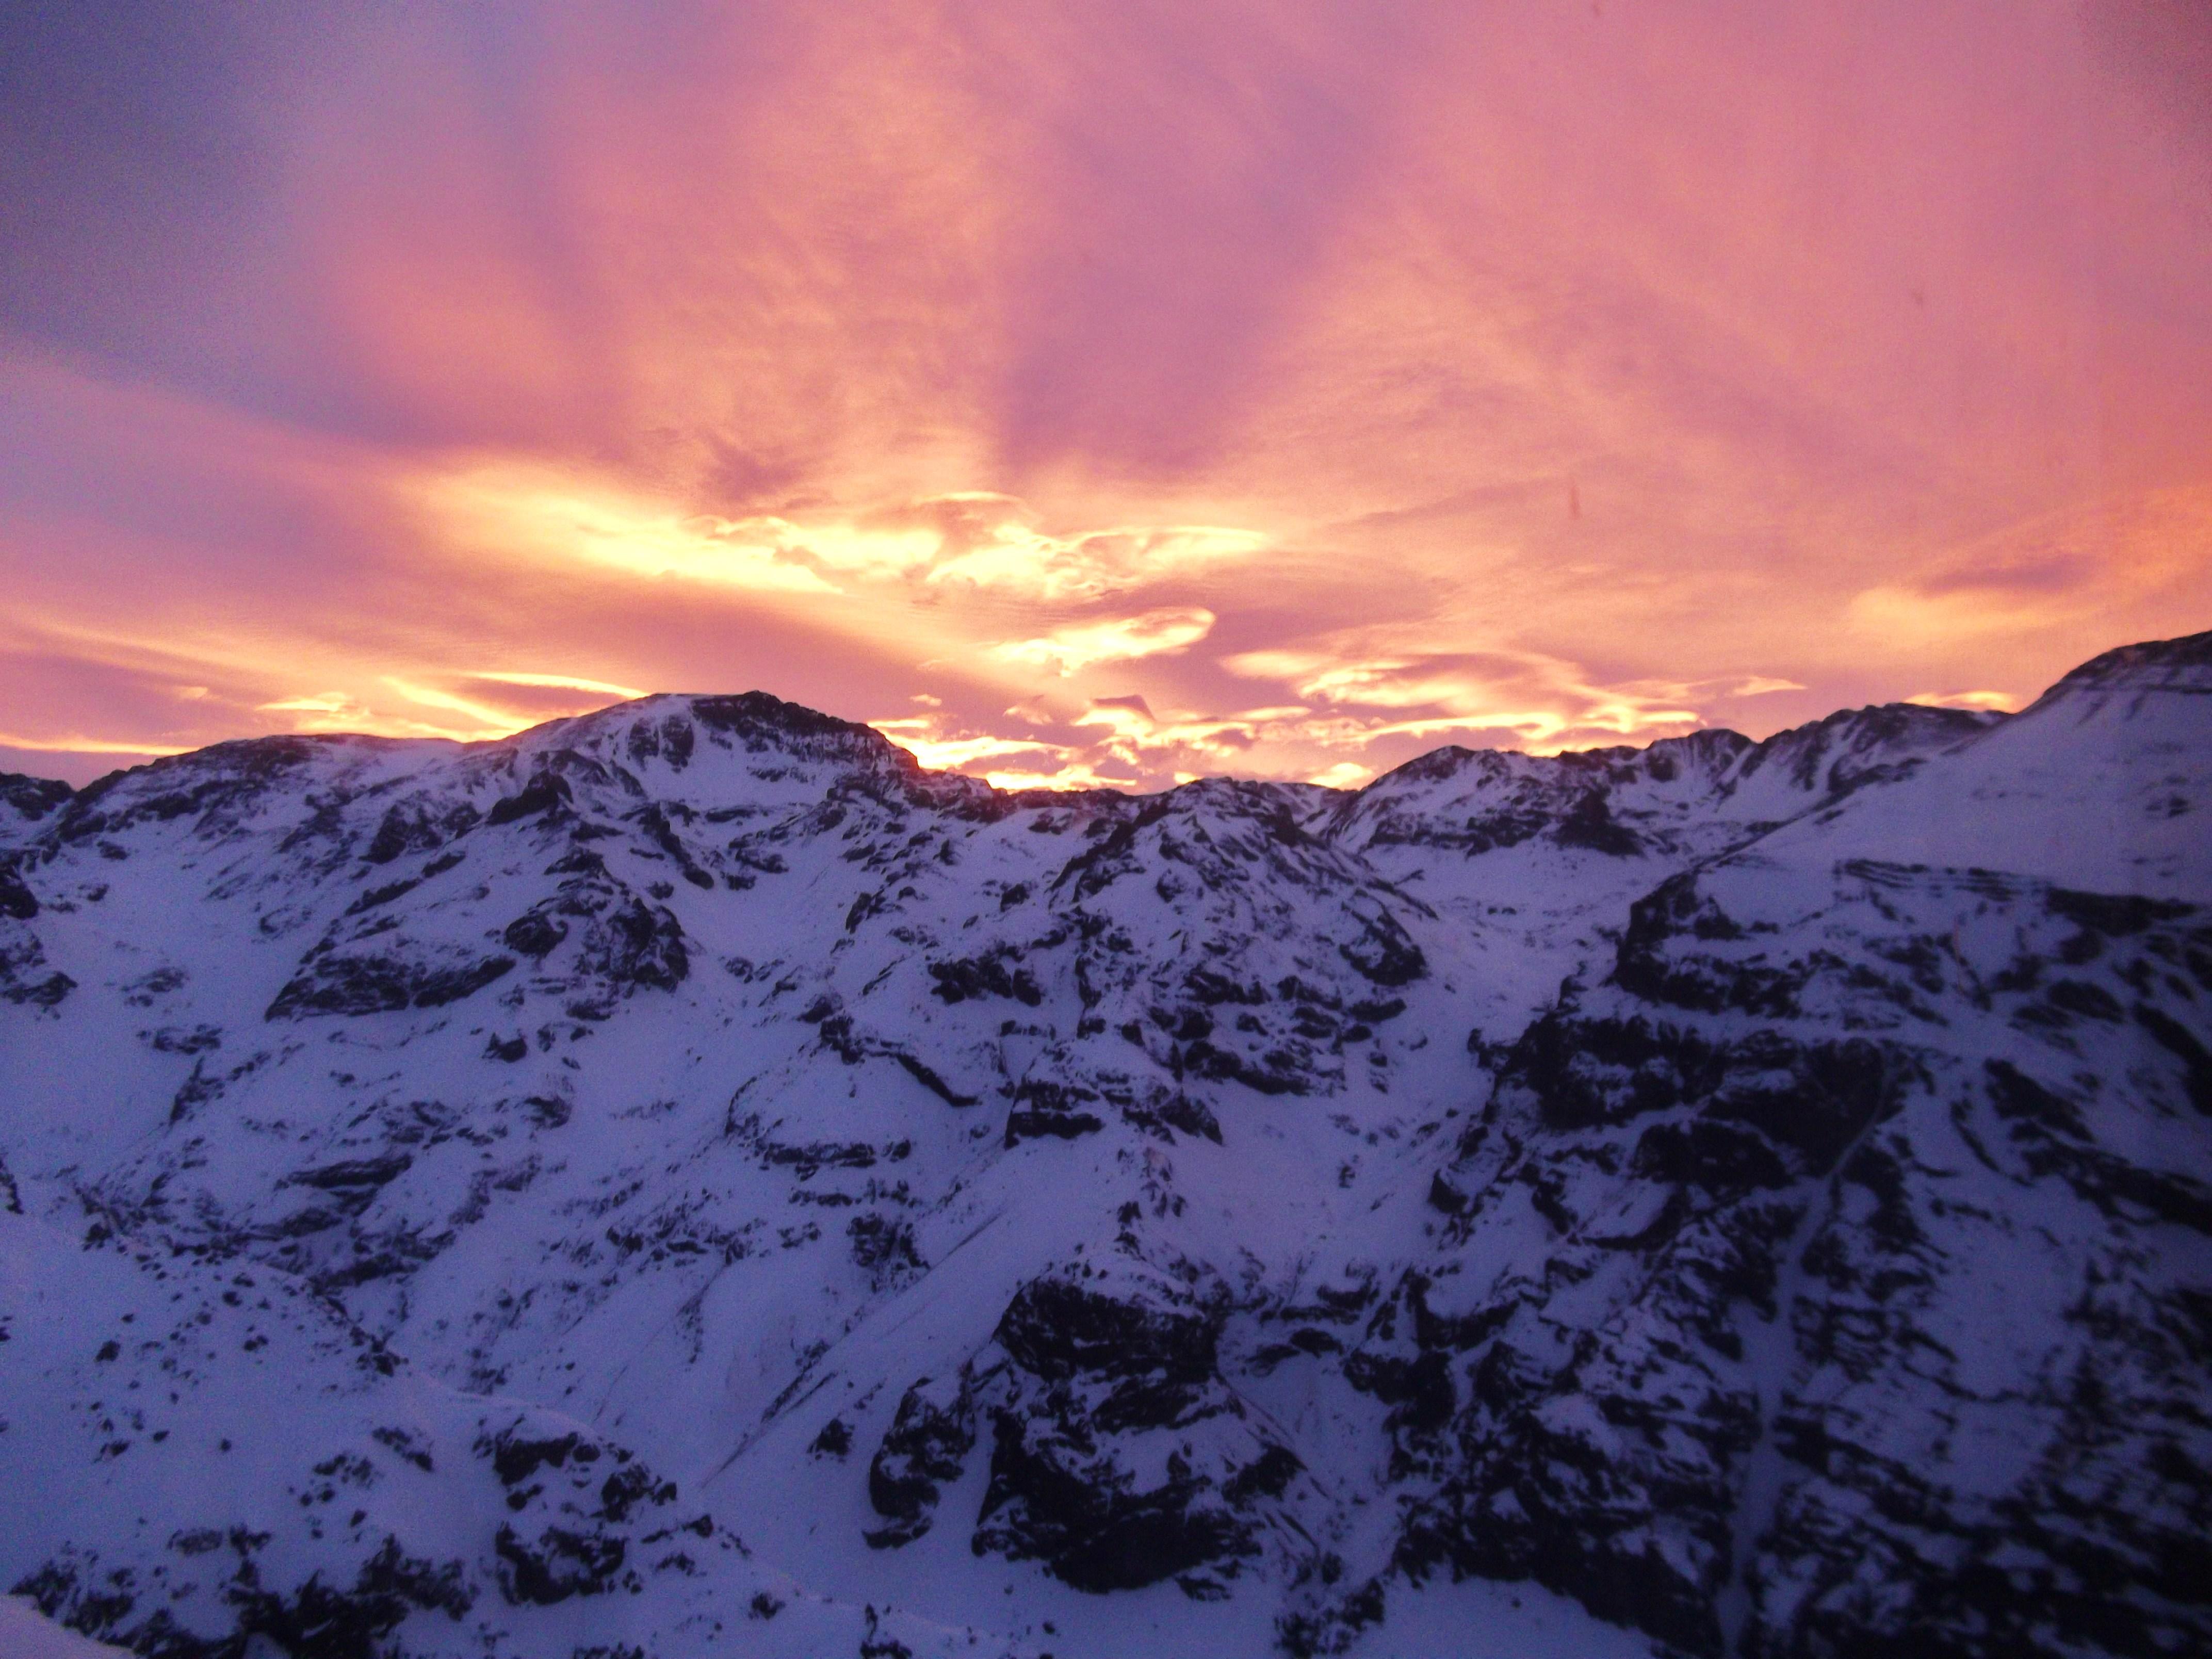 Sunrise in valle nevado